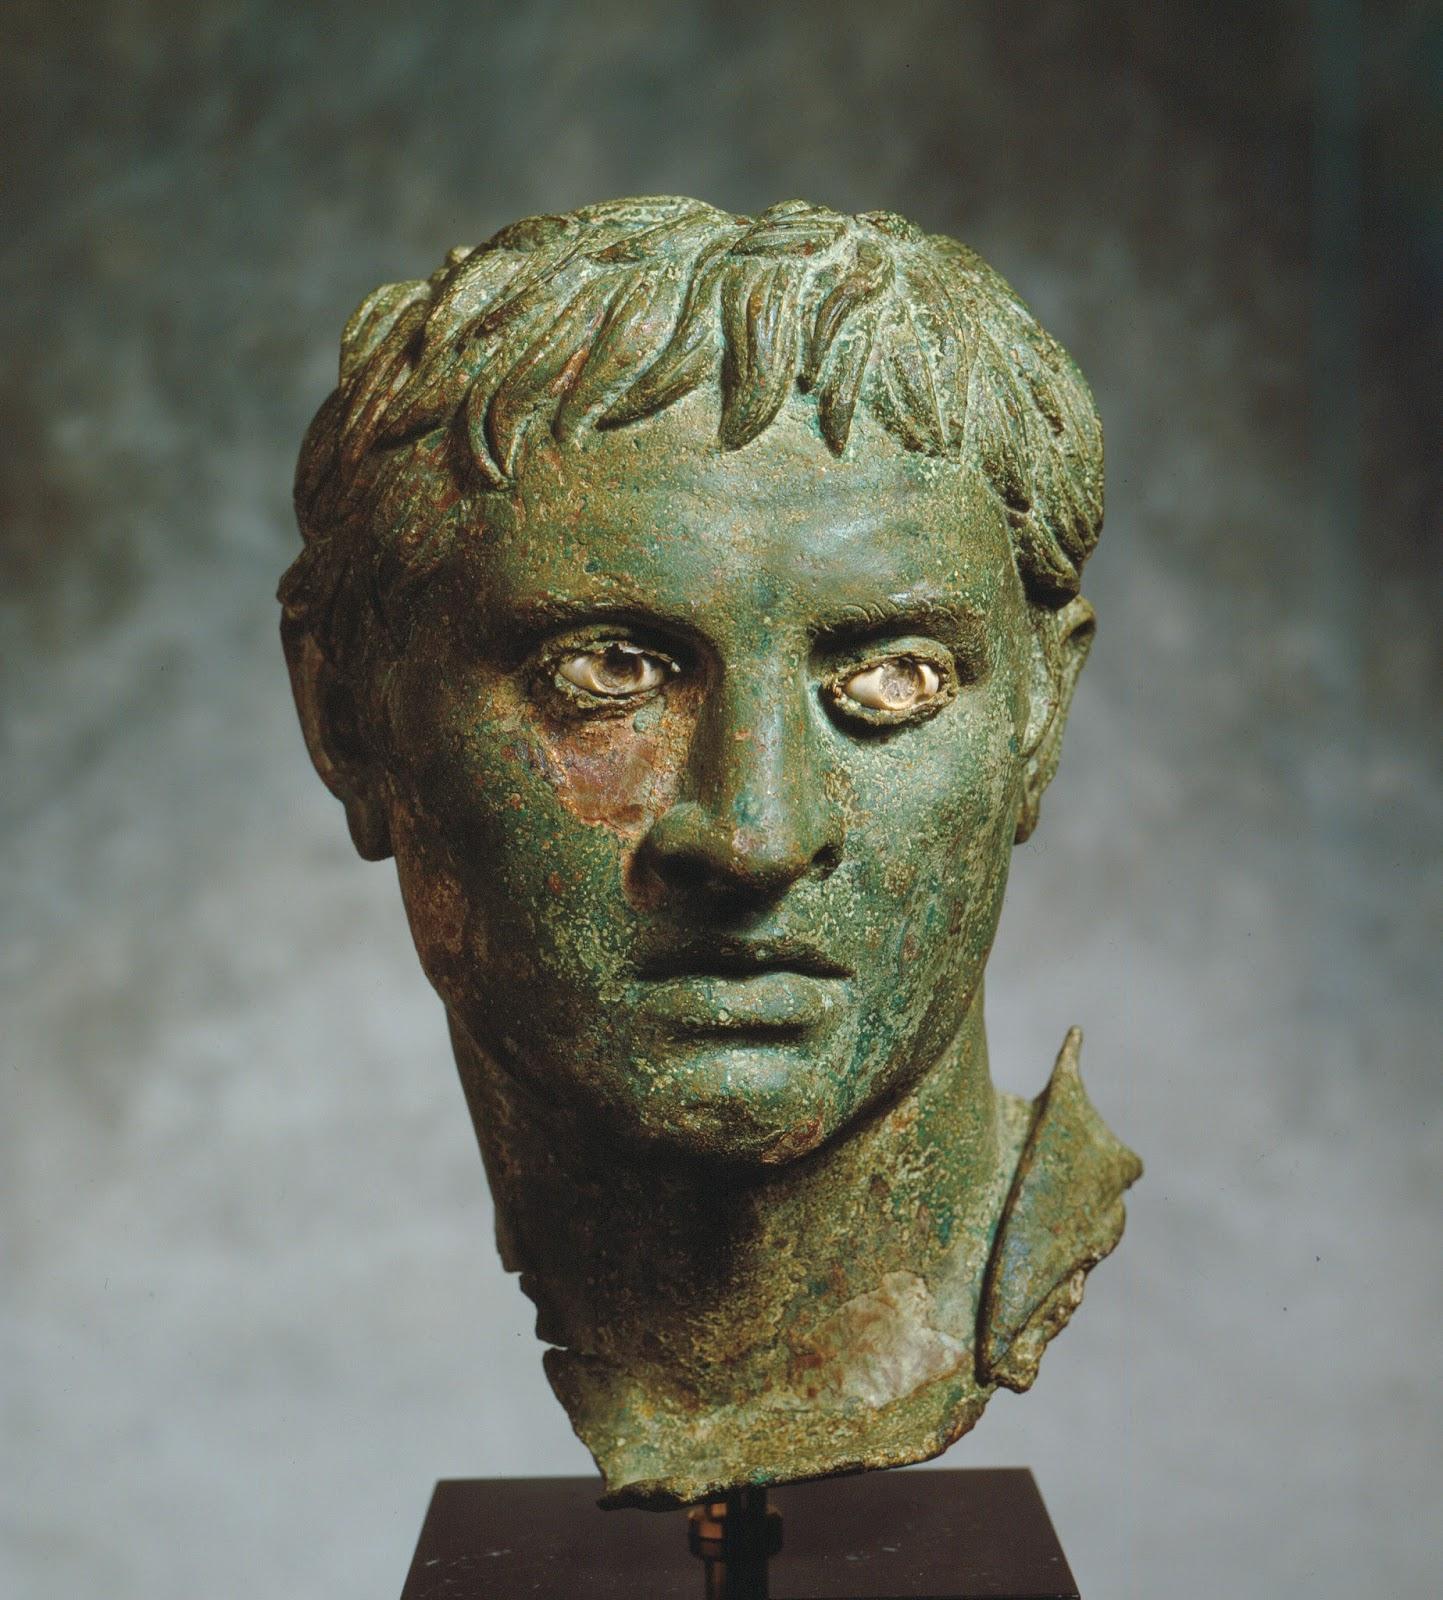 Hellenistic art sculpture